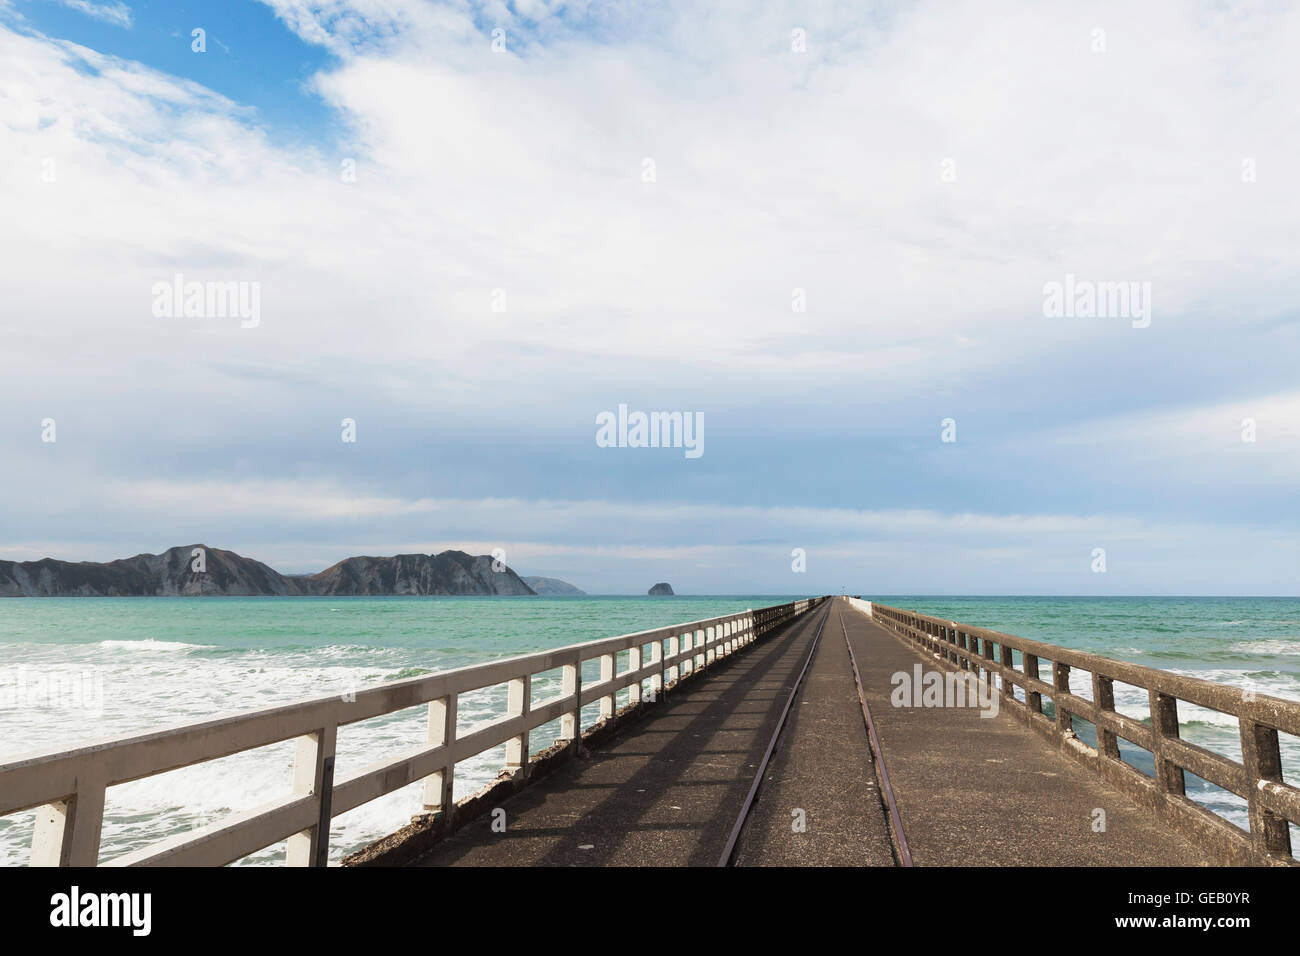 New Zealand, North Island, East Cape Region, Tolaga Bay, historic Tologa Bay Wharf, South Pacific Ocean, area of - Stock Image